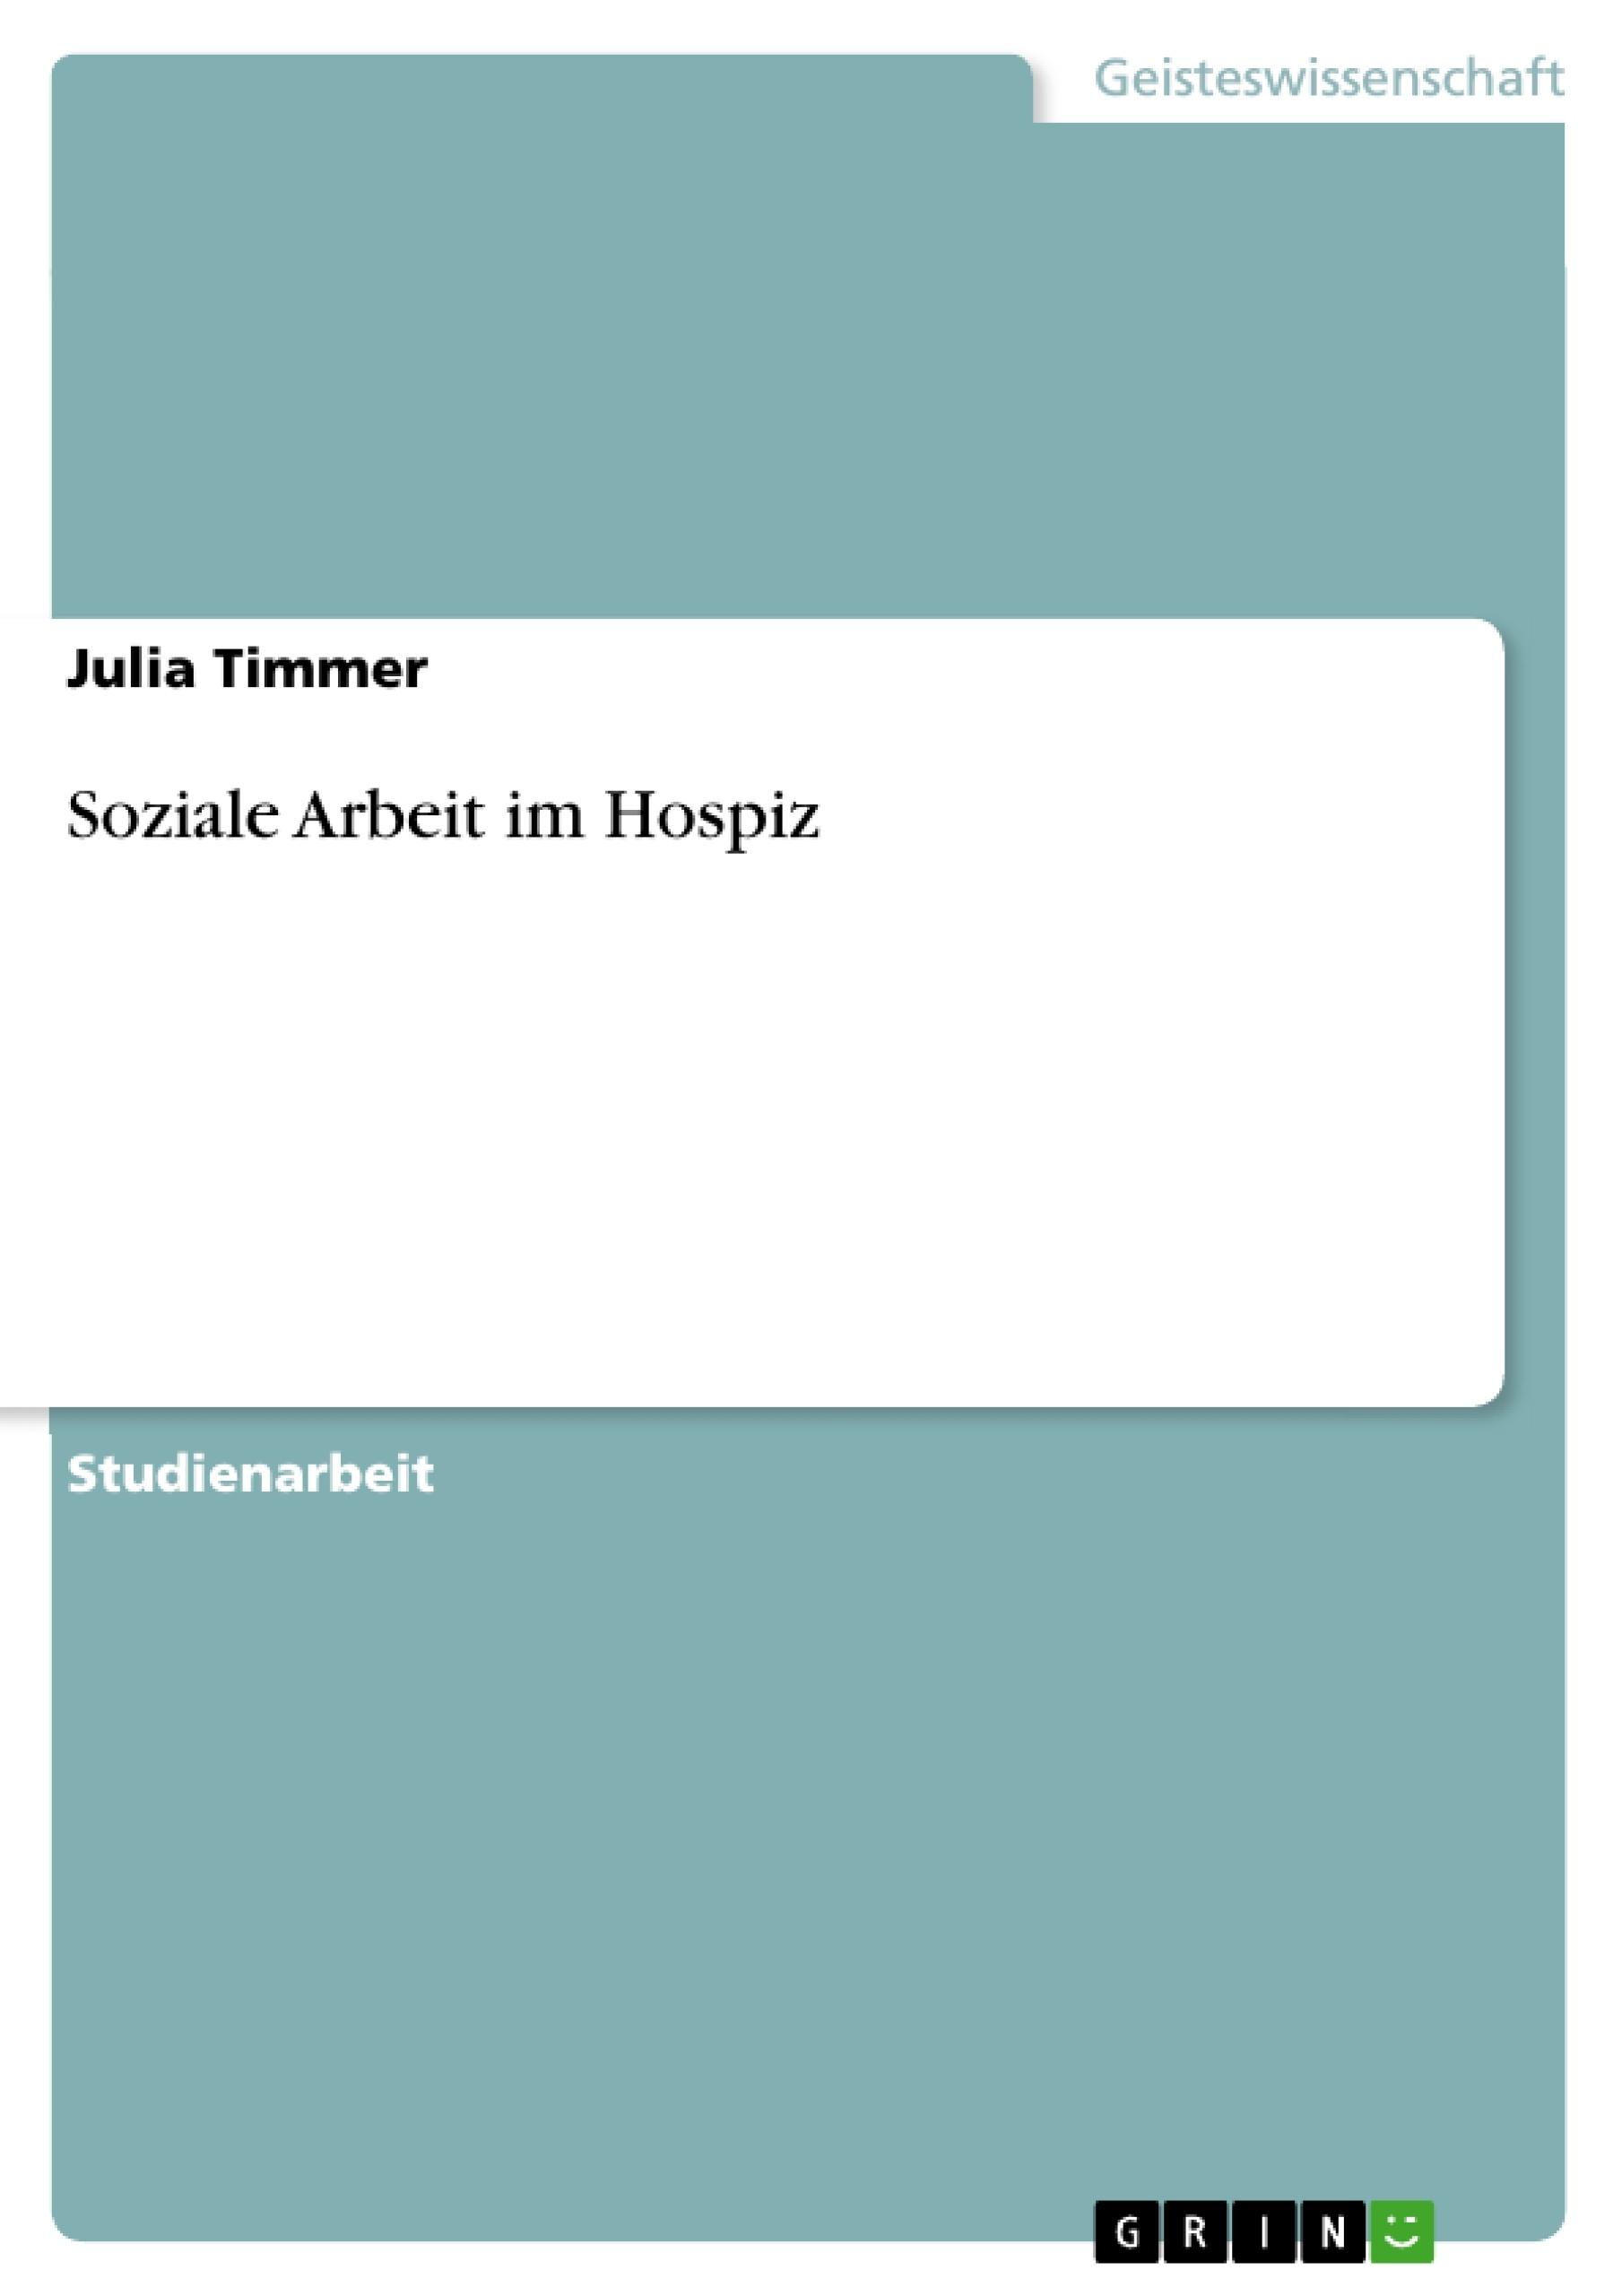 Titel: Soziale Arbeit im Hospiz